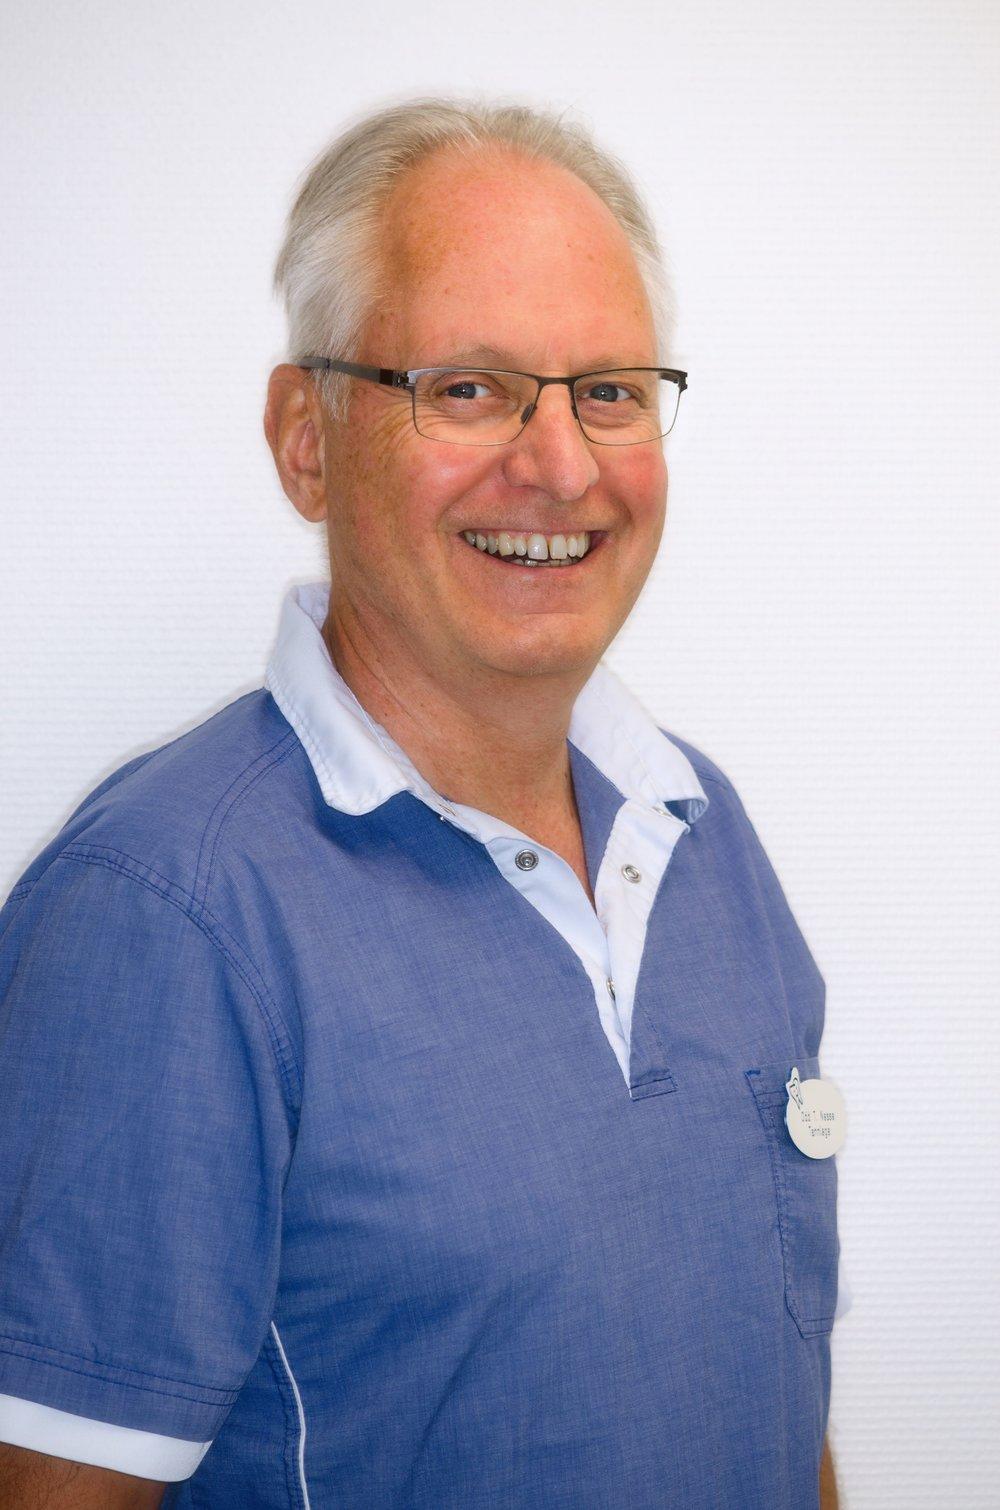 Tannlege Odd T. Nesse - spesialkompetanse implantatprotetikk